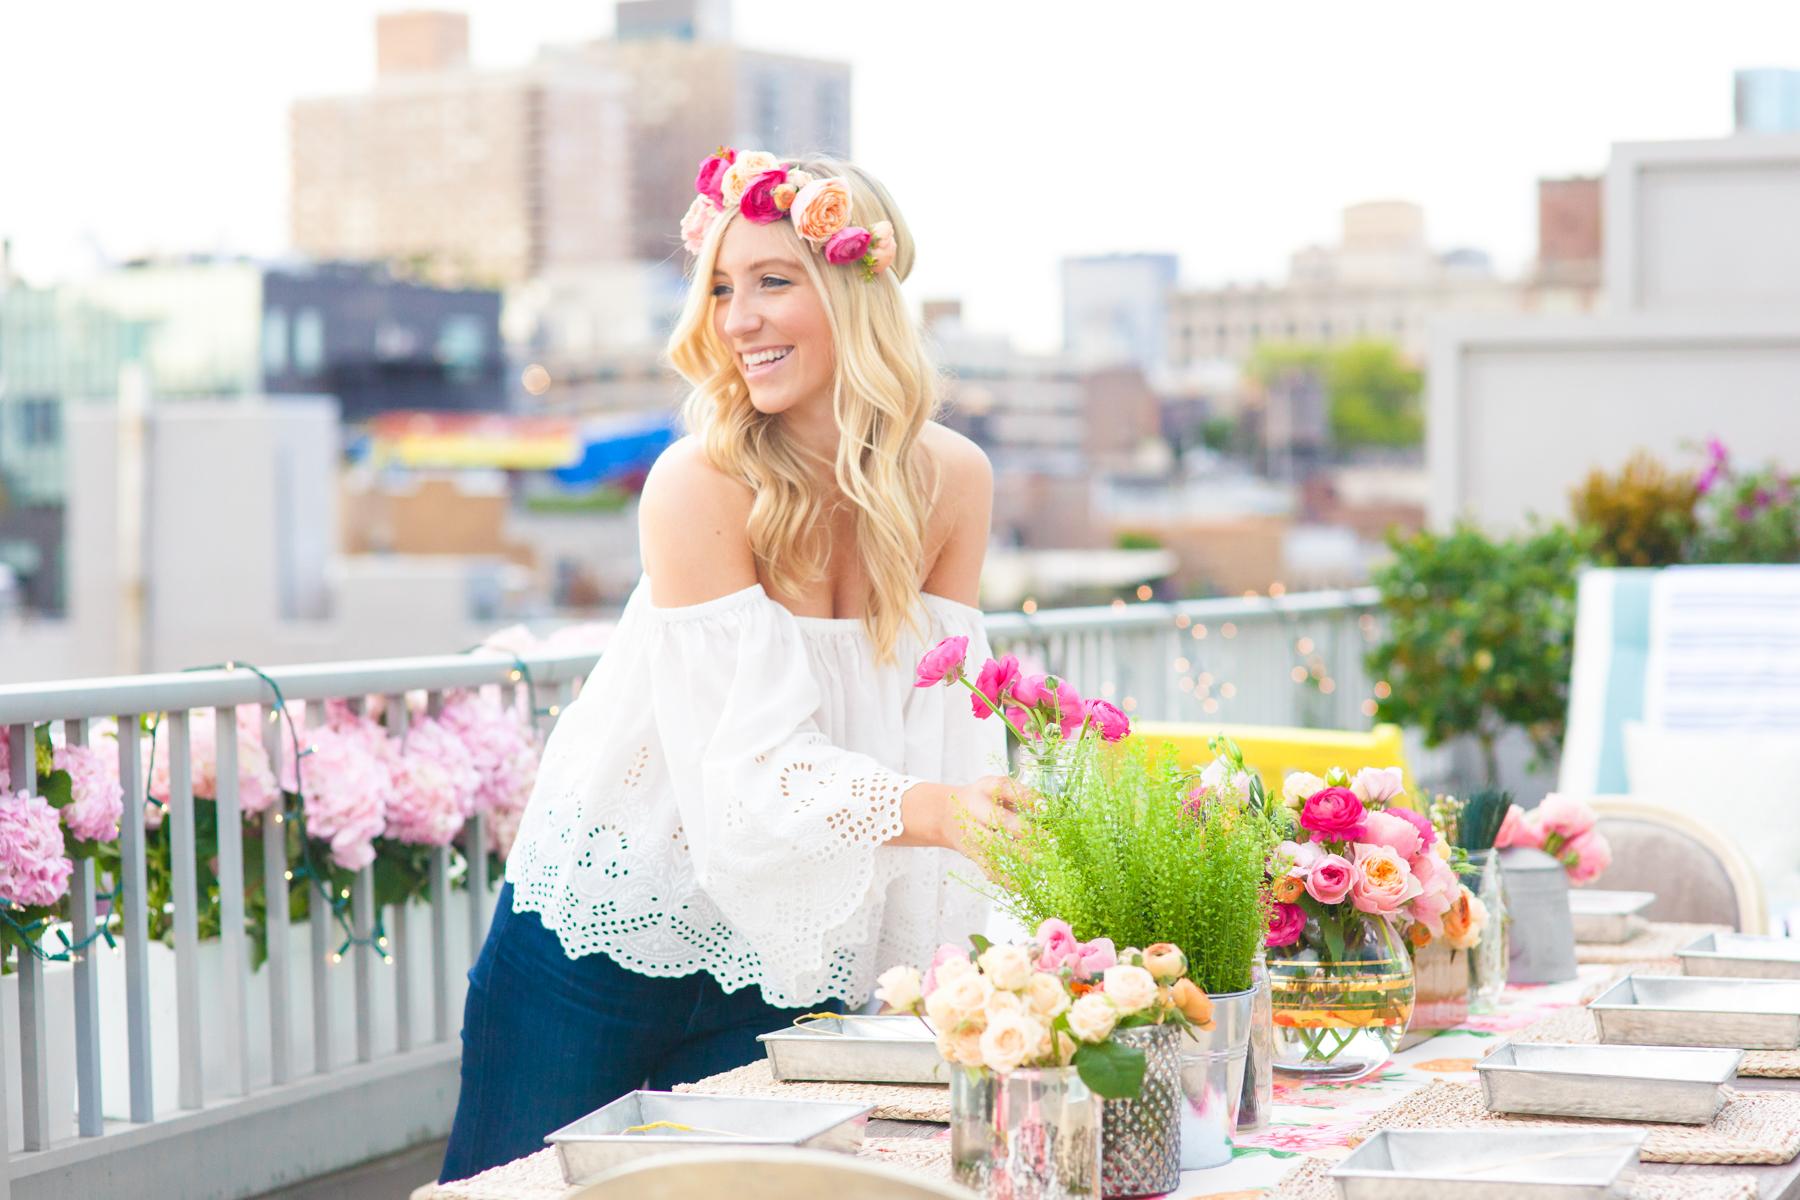 Lauren Nelson Flower Crown Party Ideas